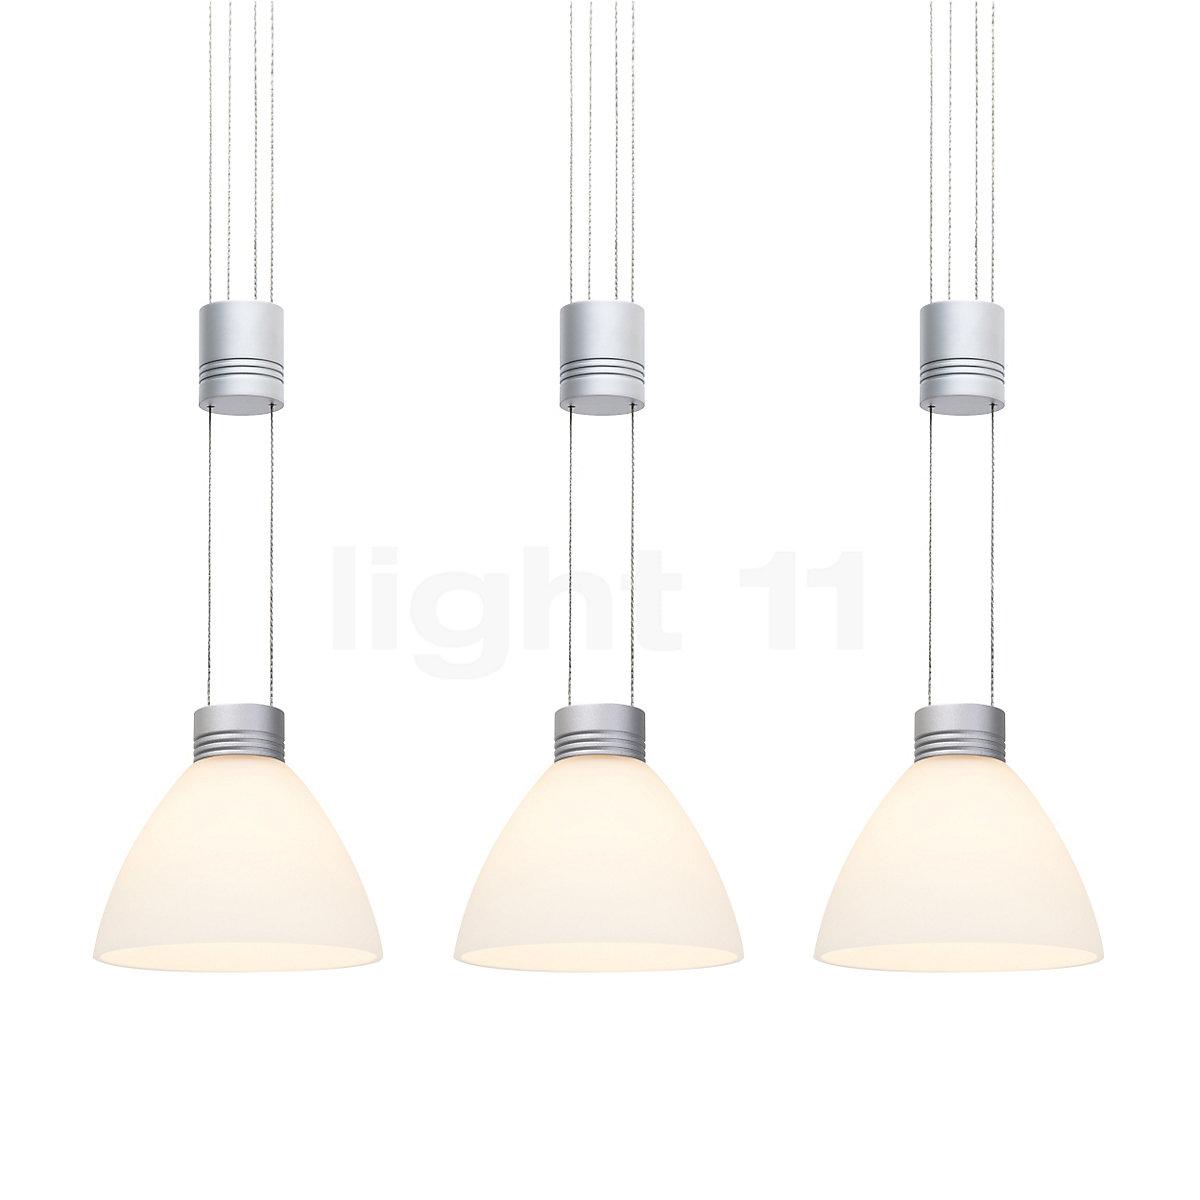 Oligo Pull It Pendant Light 3 Lamps At Light11 Eu